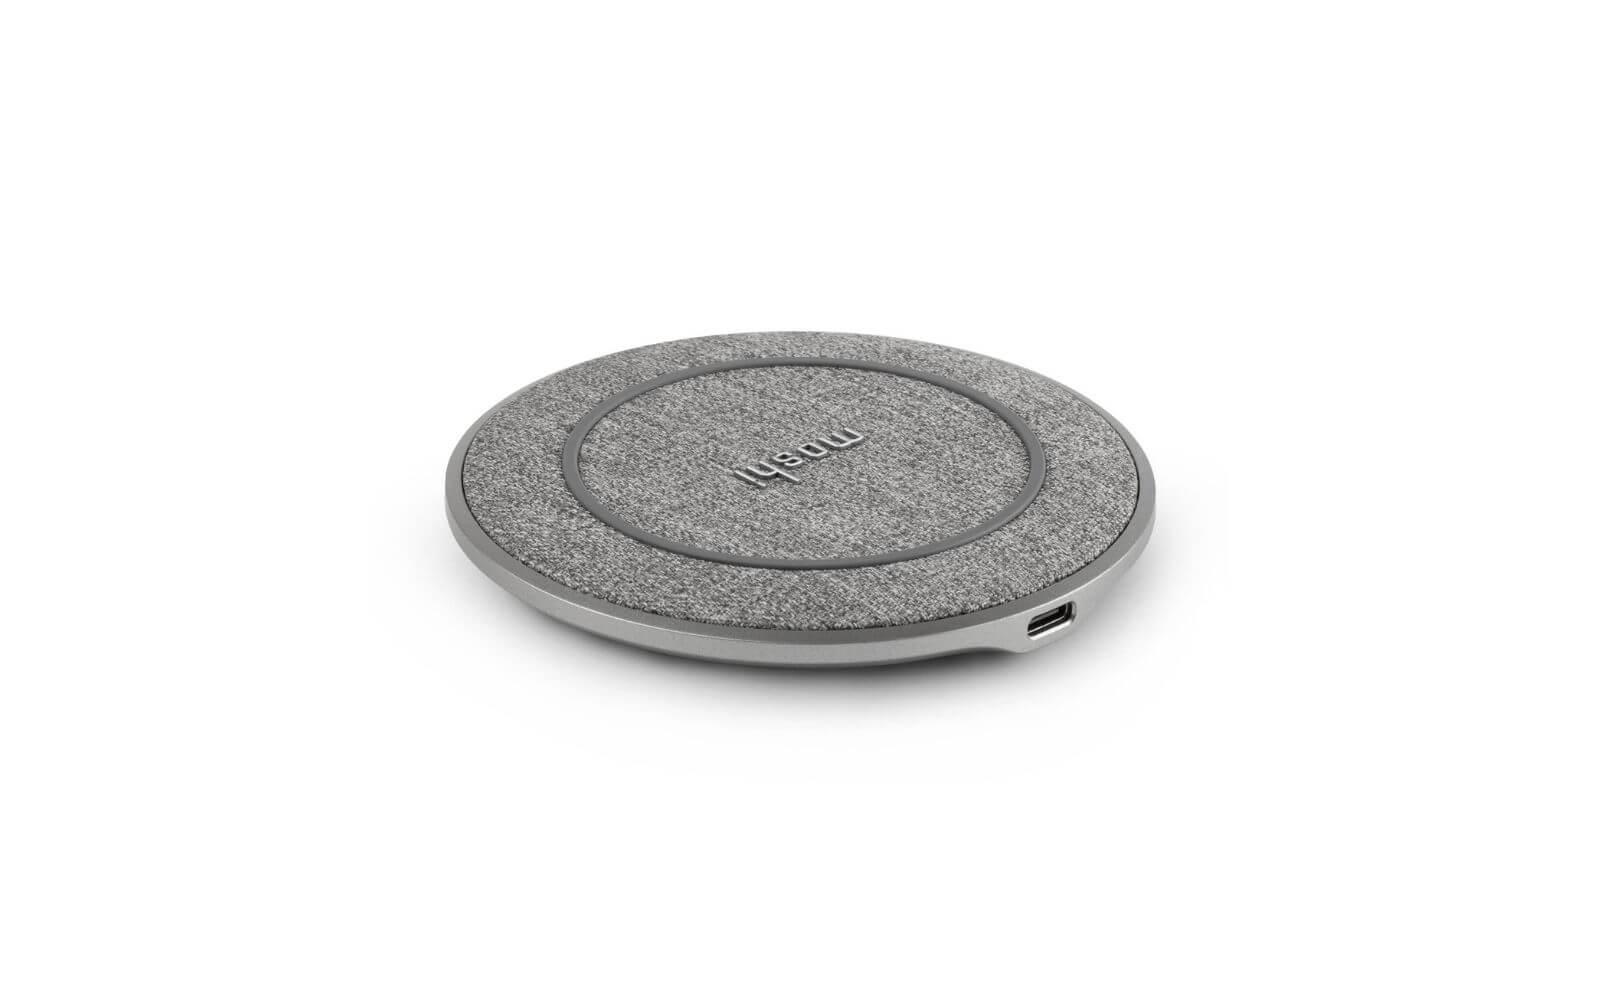 Otto Q Wireless Charging Pad